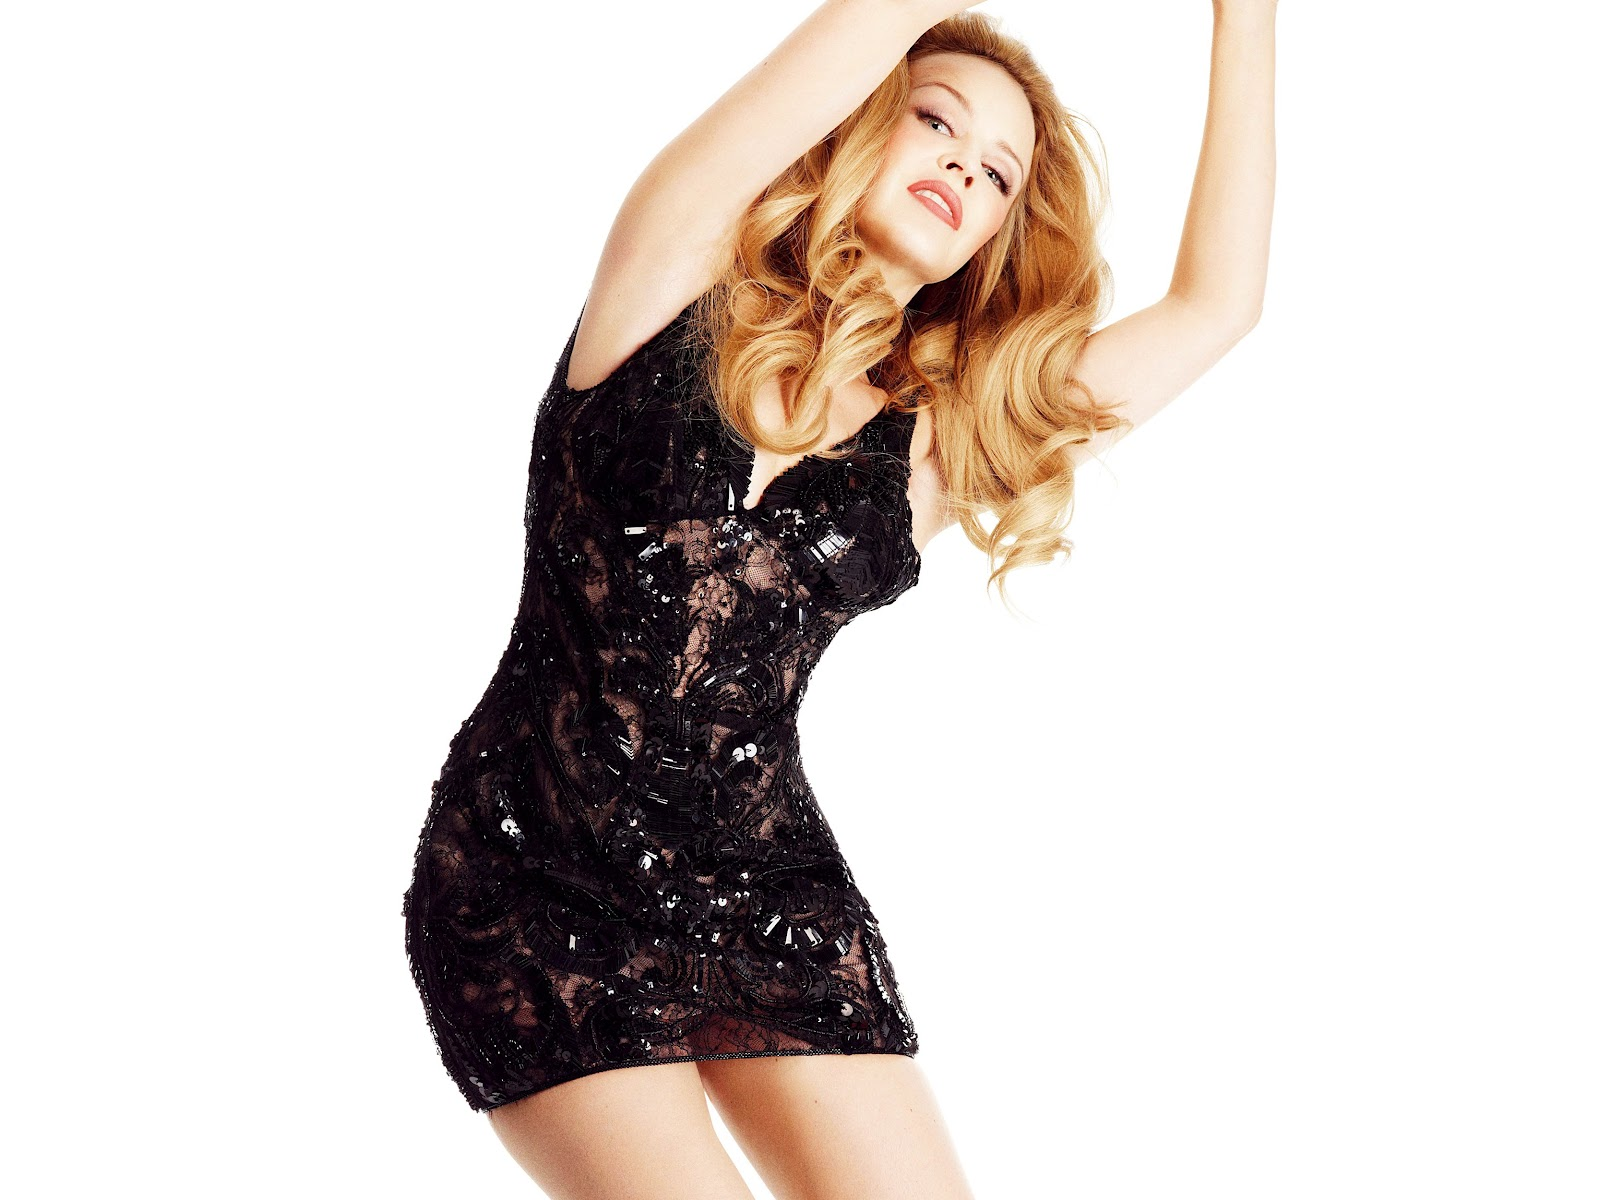 http://1.bp.blogspot.com/-NXYgtF3cQNs/T0J-HqZpbBI/AAAAAAAAAwo/wtOX1riEUe4/s1600/www-bruce-juice-com_Kylie-Minogue-Stylist-Magazine-Photoshoot-February-2012-4.jpg